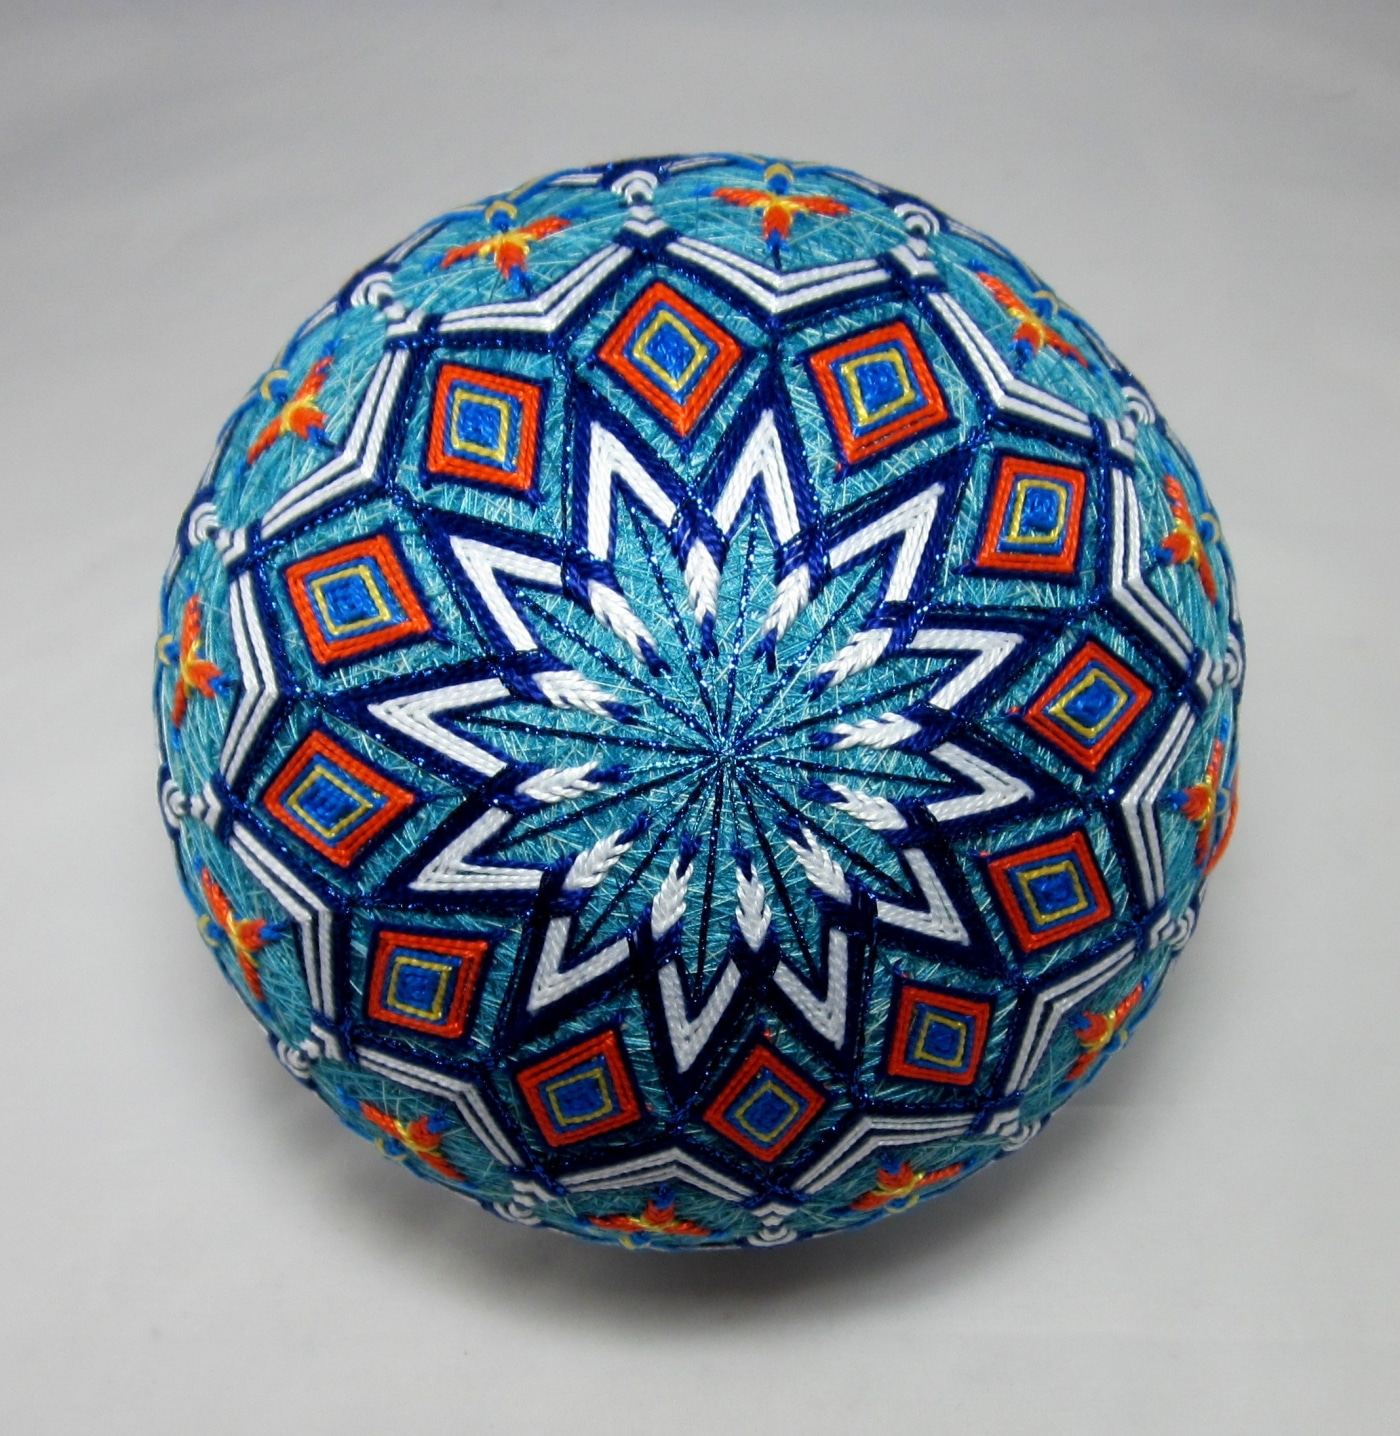 Temari balls with geometric patterns